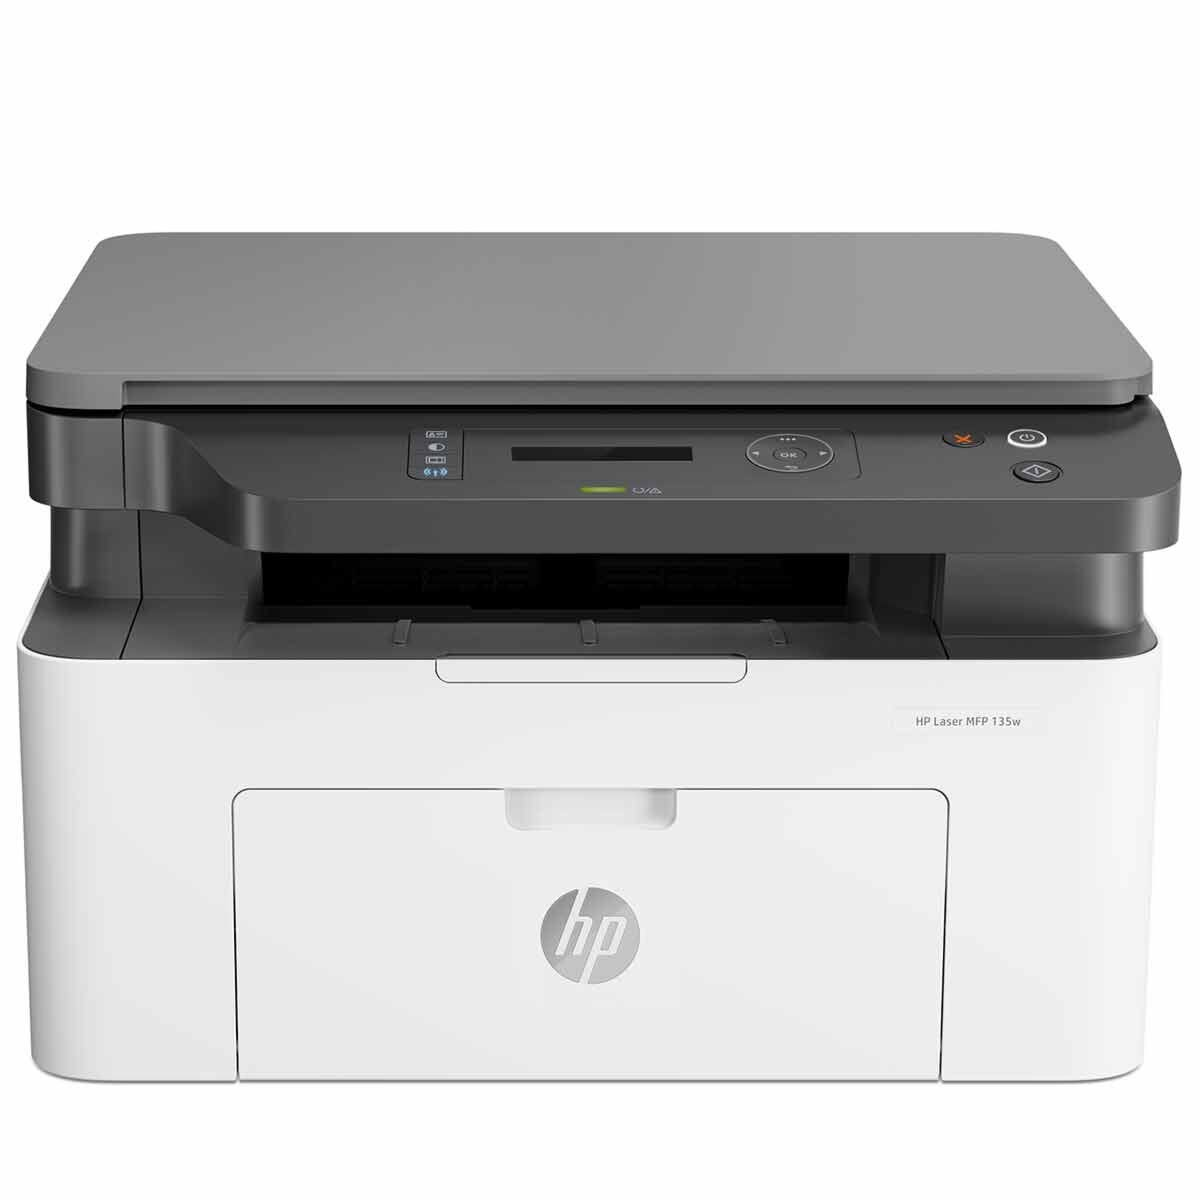 HP Laser 135w Multifunction Wireless Printer